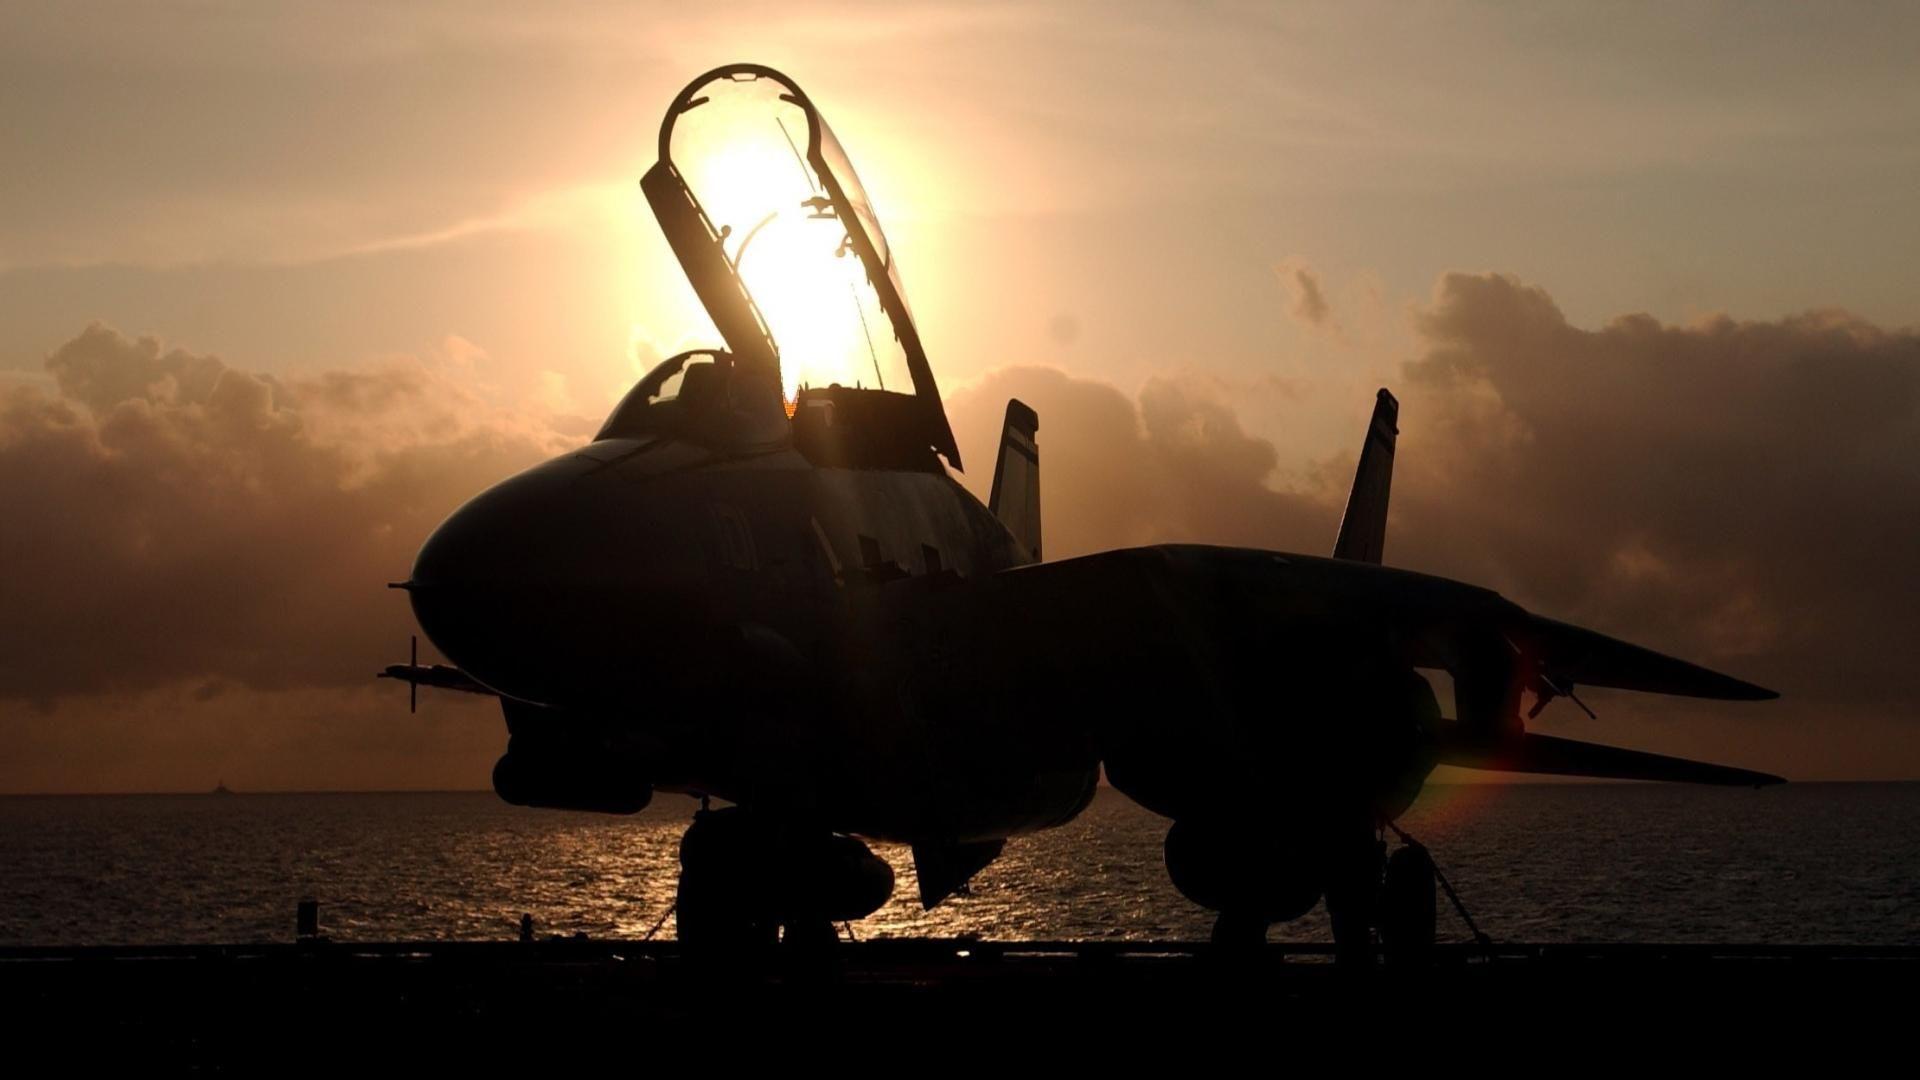 Grumman F 14 Tomcat Wallpapers Hd F 14 Tomcat Fotos Aeronave